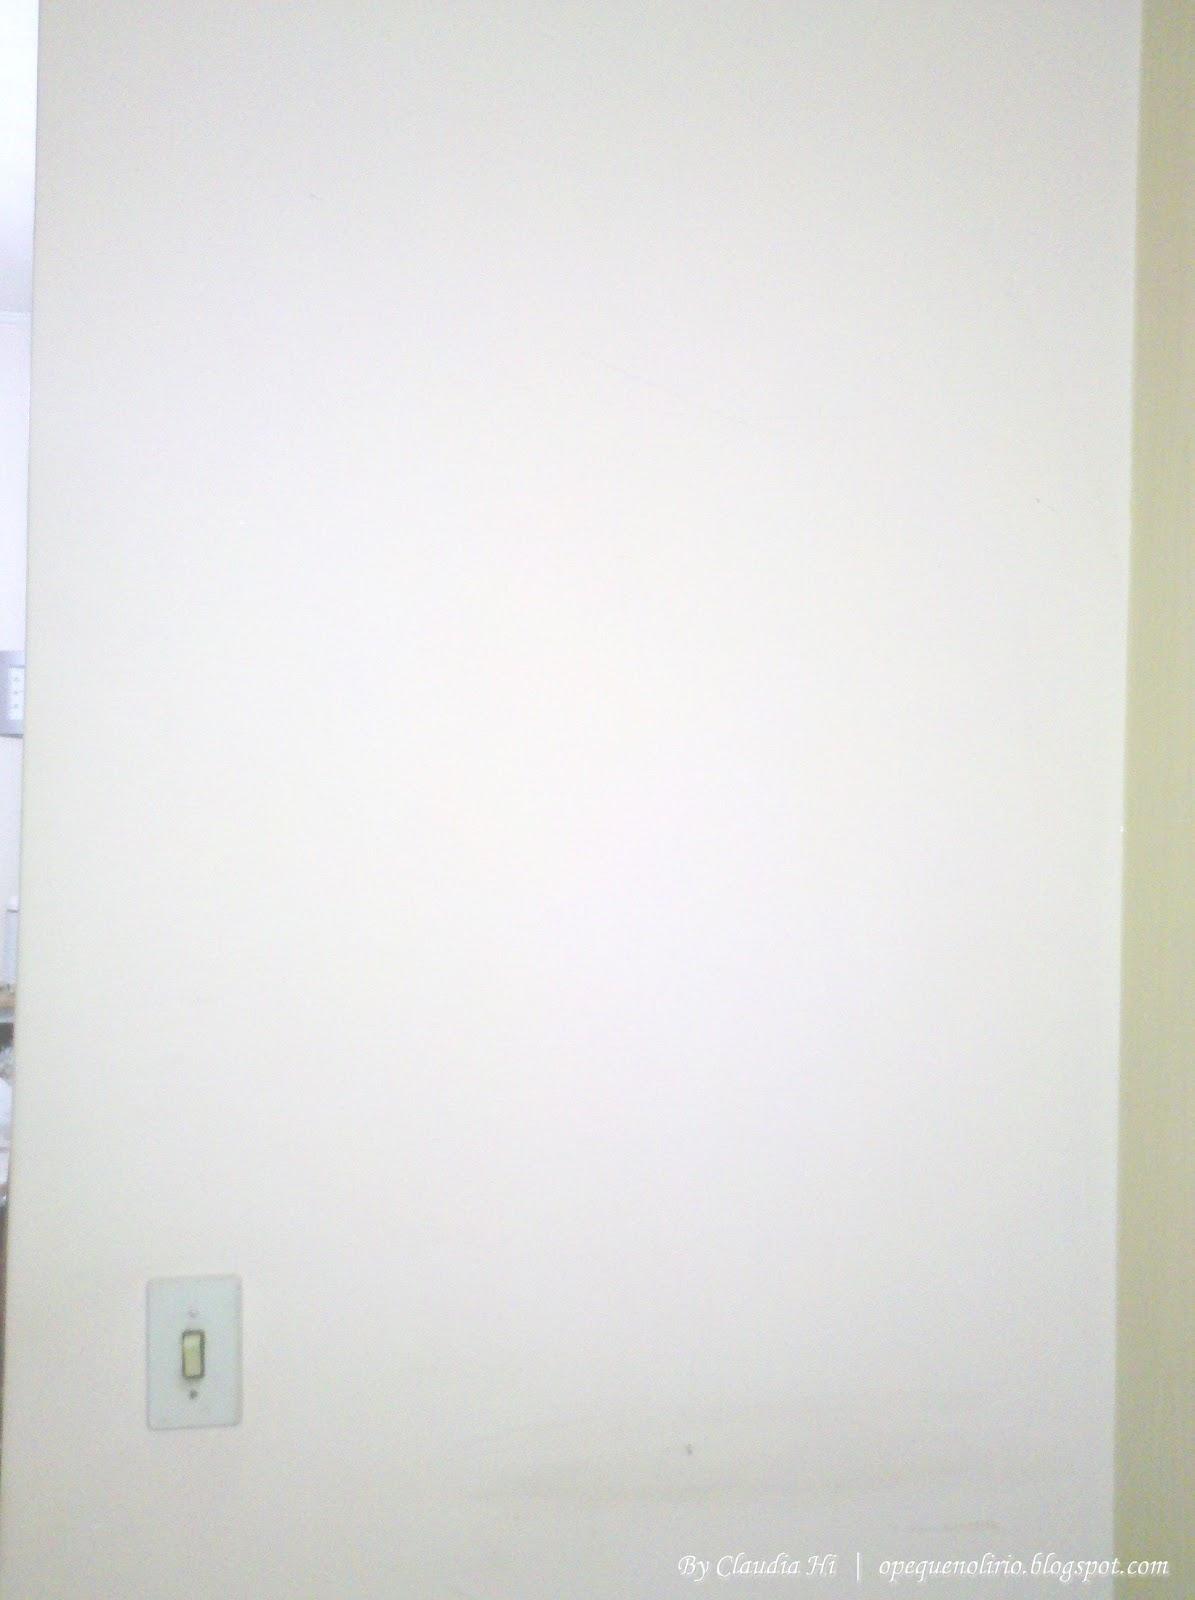 parede, lousinha, mural, bordas de contact, desenhar, quadro branco, parede